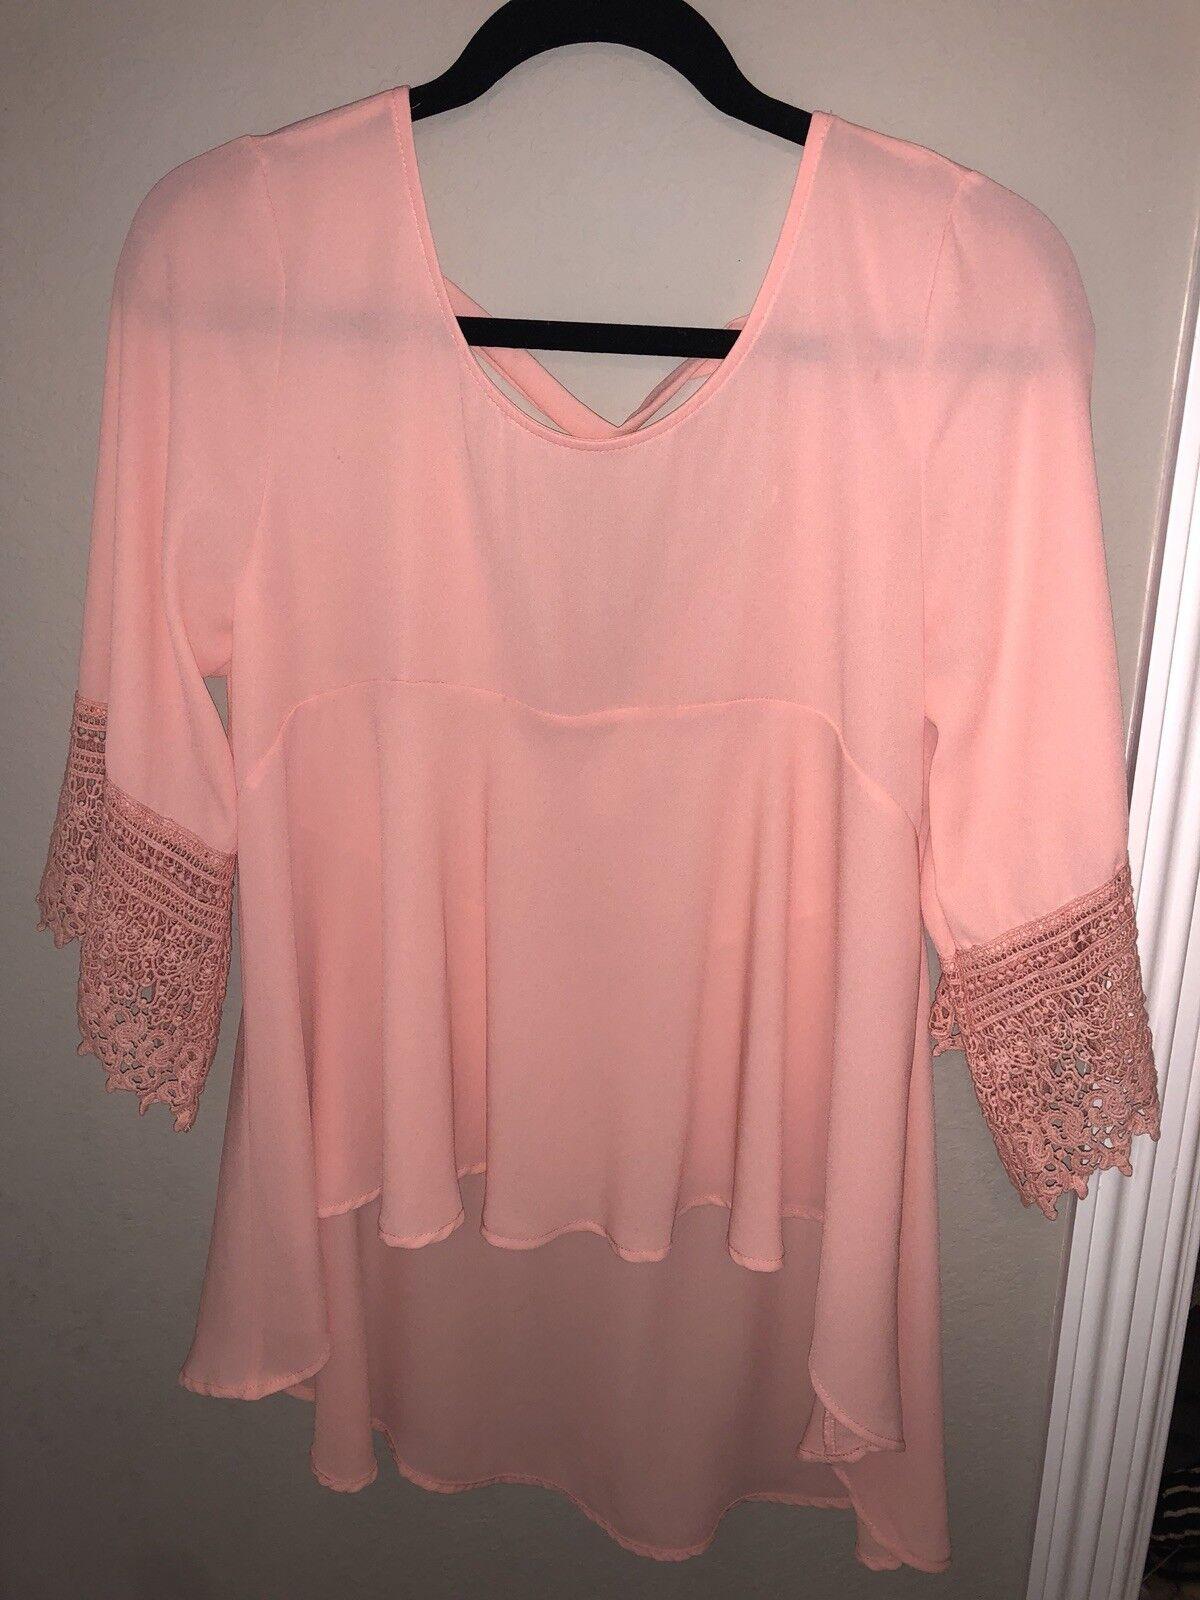 damen's altar'd state Rosa coral flowy shirt blouse top Größe S never NWOT